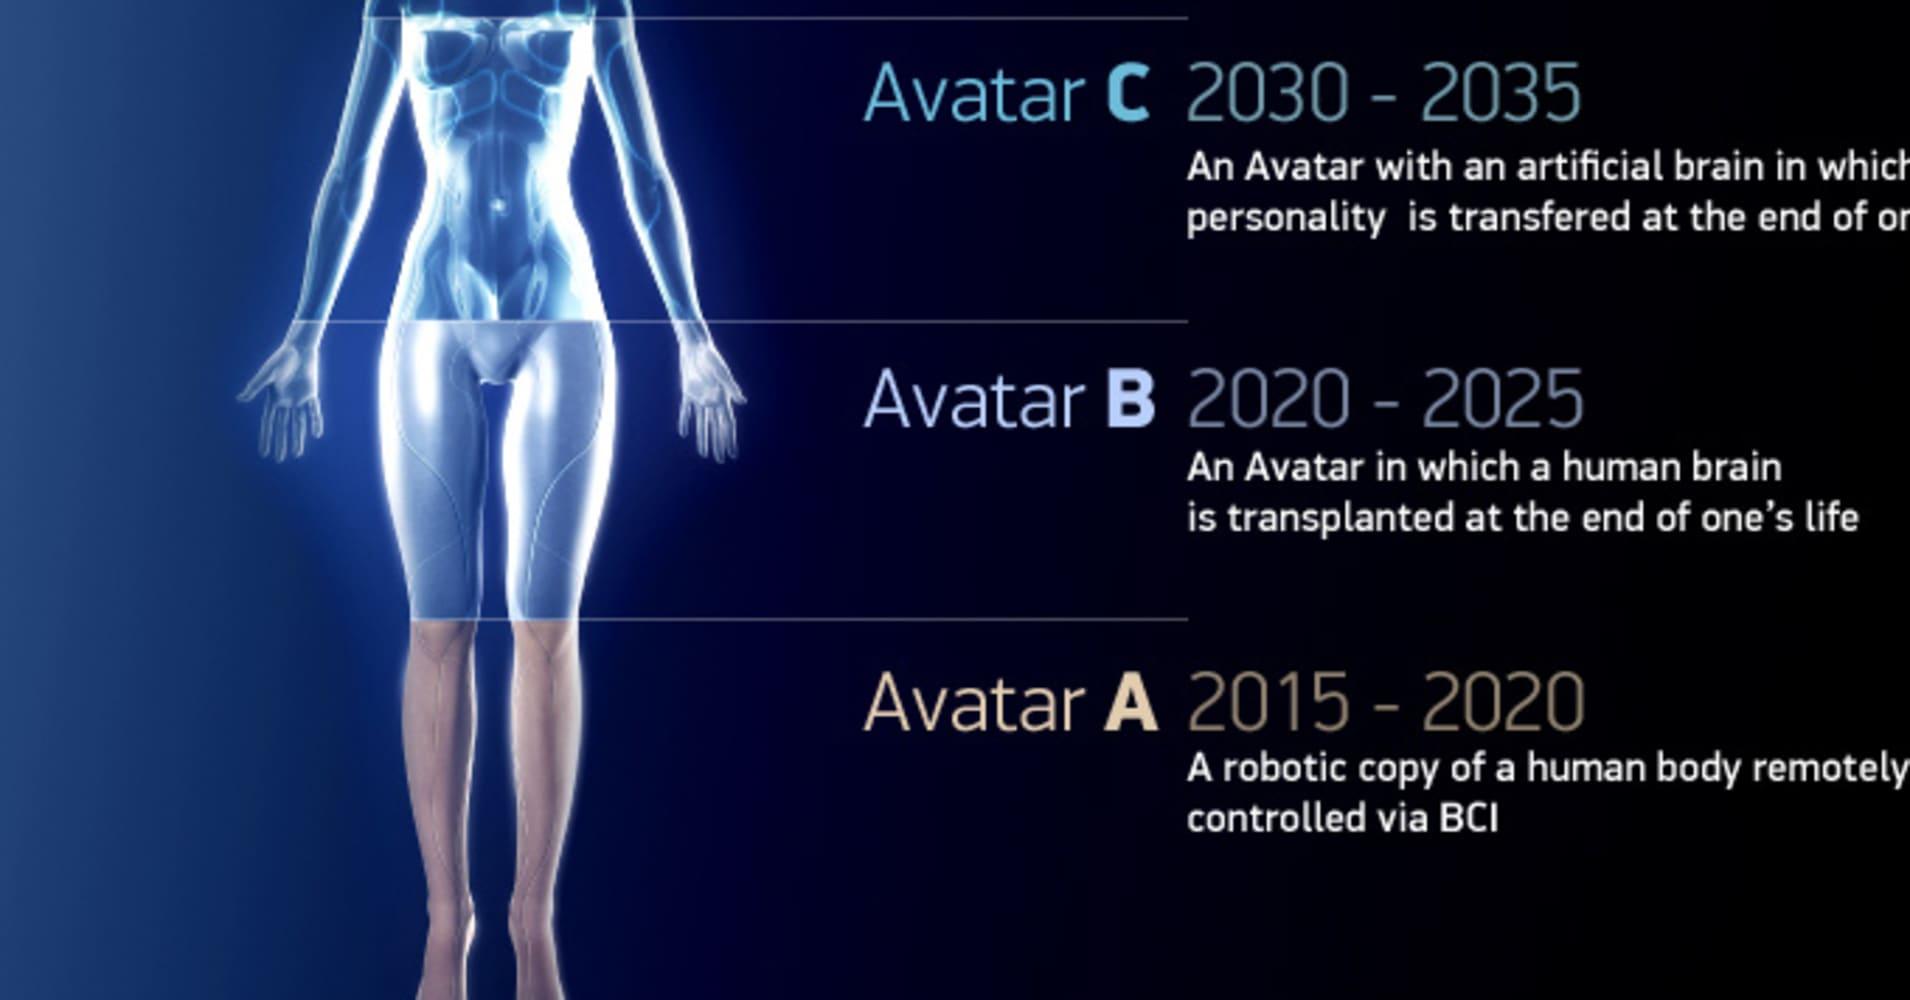 future iphone 1000. future iphone 1000